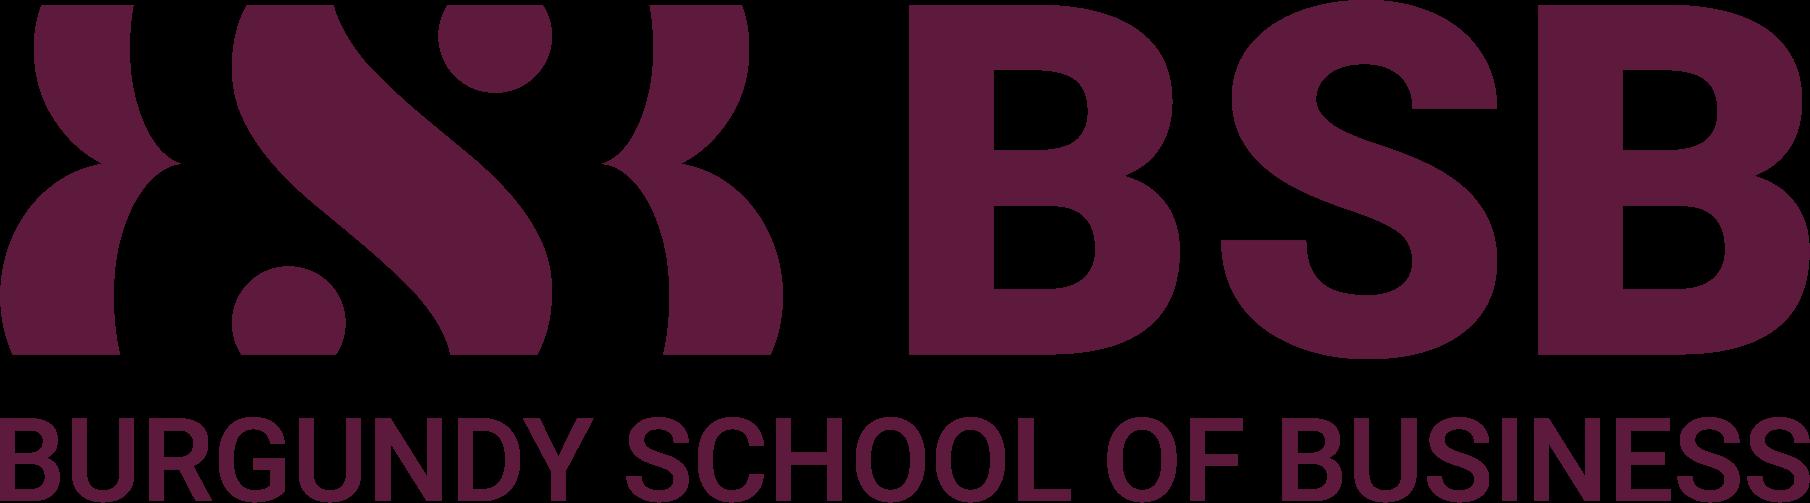 BSB_logo_burgundy